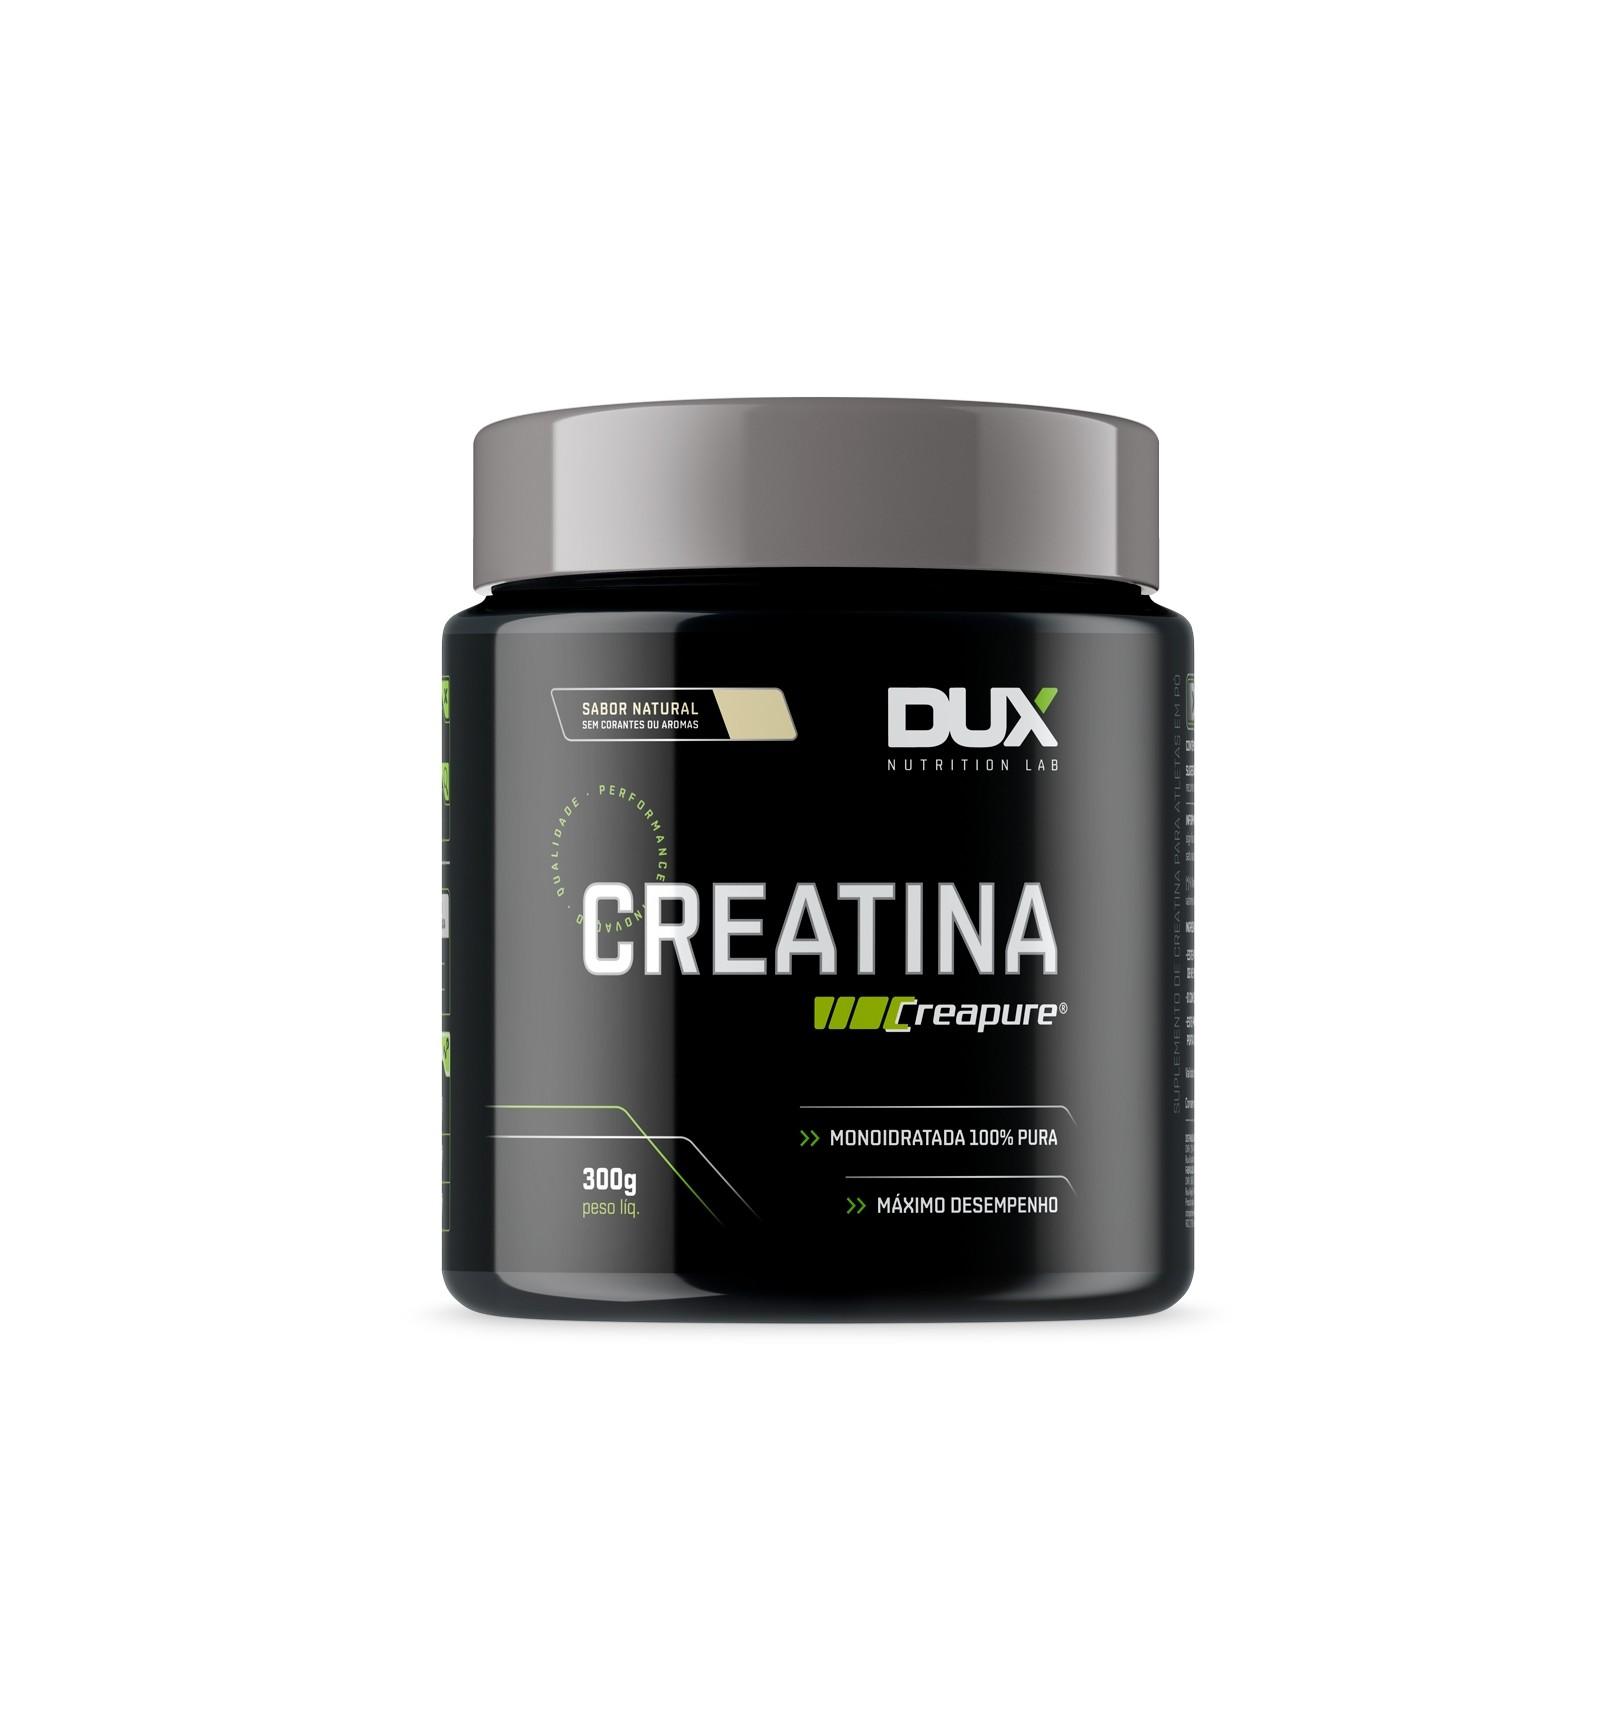 CREATINA CREAPURE 300G DUX